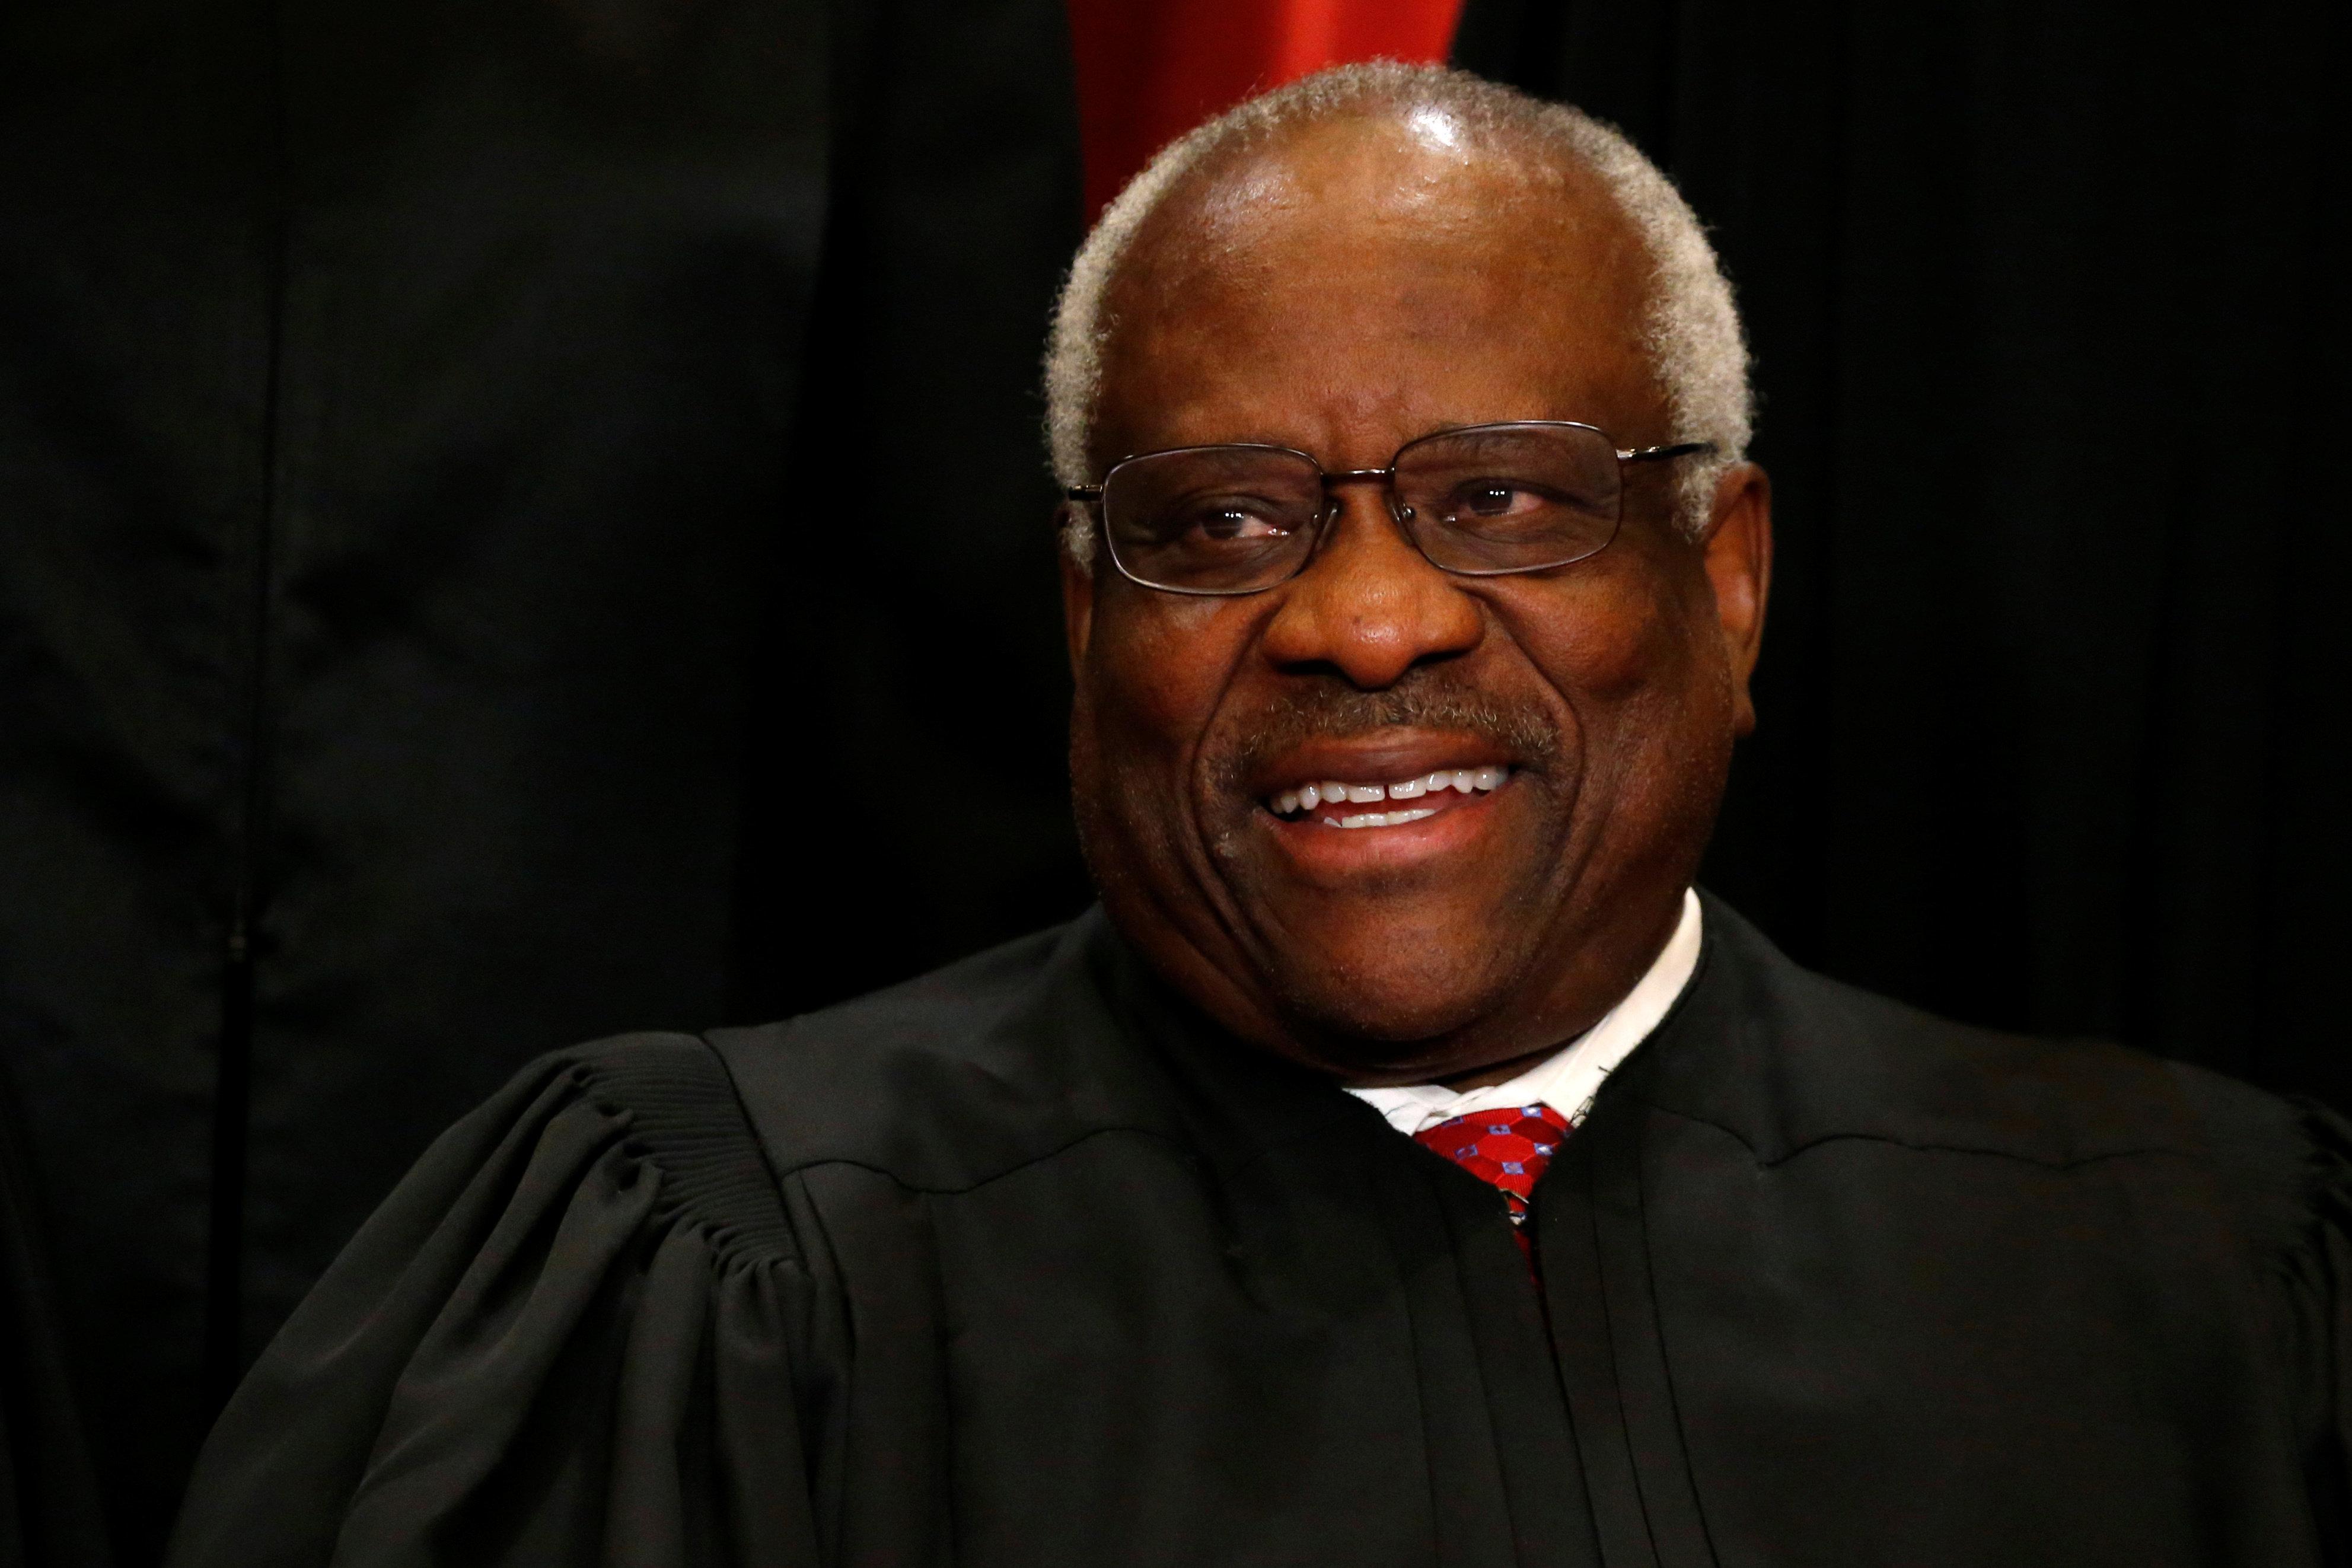 Justice Thomas Blasts Supreme Court For Undermining Gun Rights